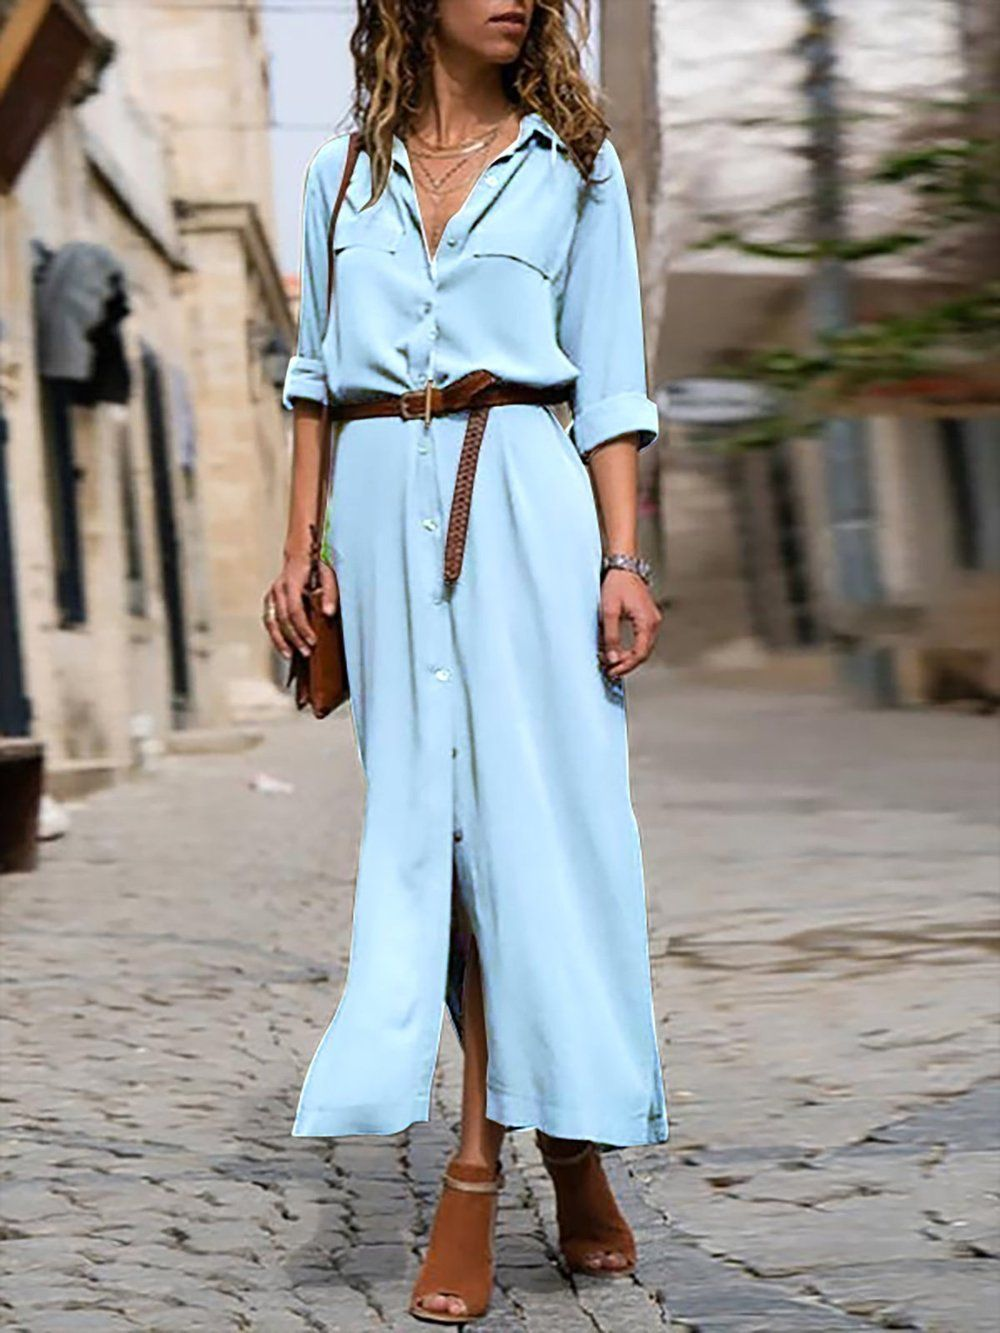 Woman Elegant Long Dress Casual 3 4 Sleeve Shawl Collar Casual Dress Summer Dresses For Women Long Dress Casual Elegant Dresses Long [ 1333 x 1000 Pixel ]